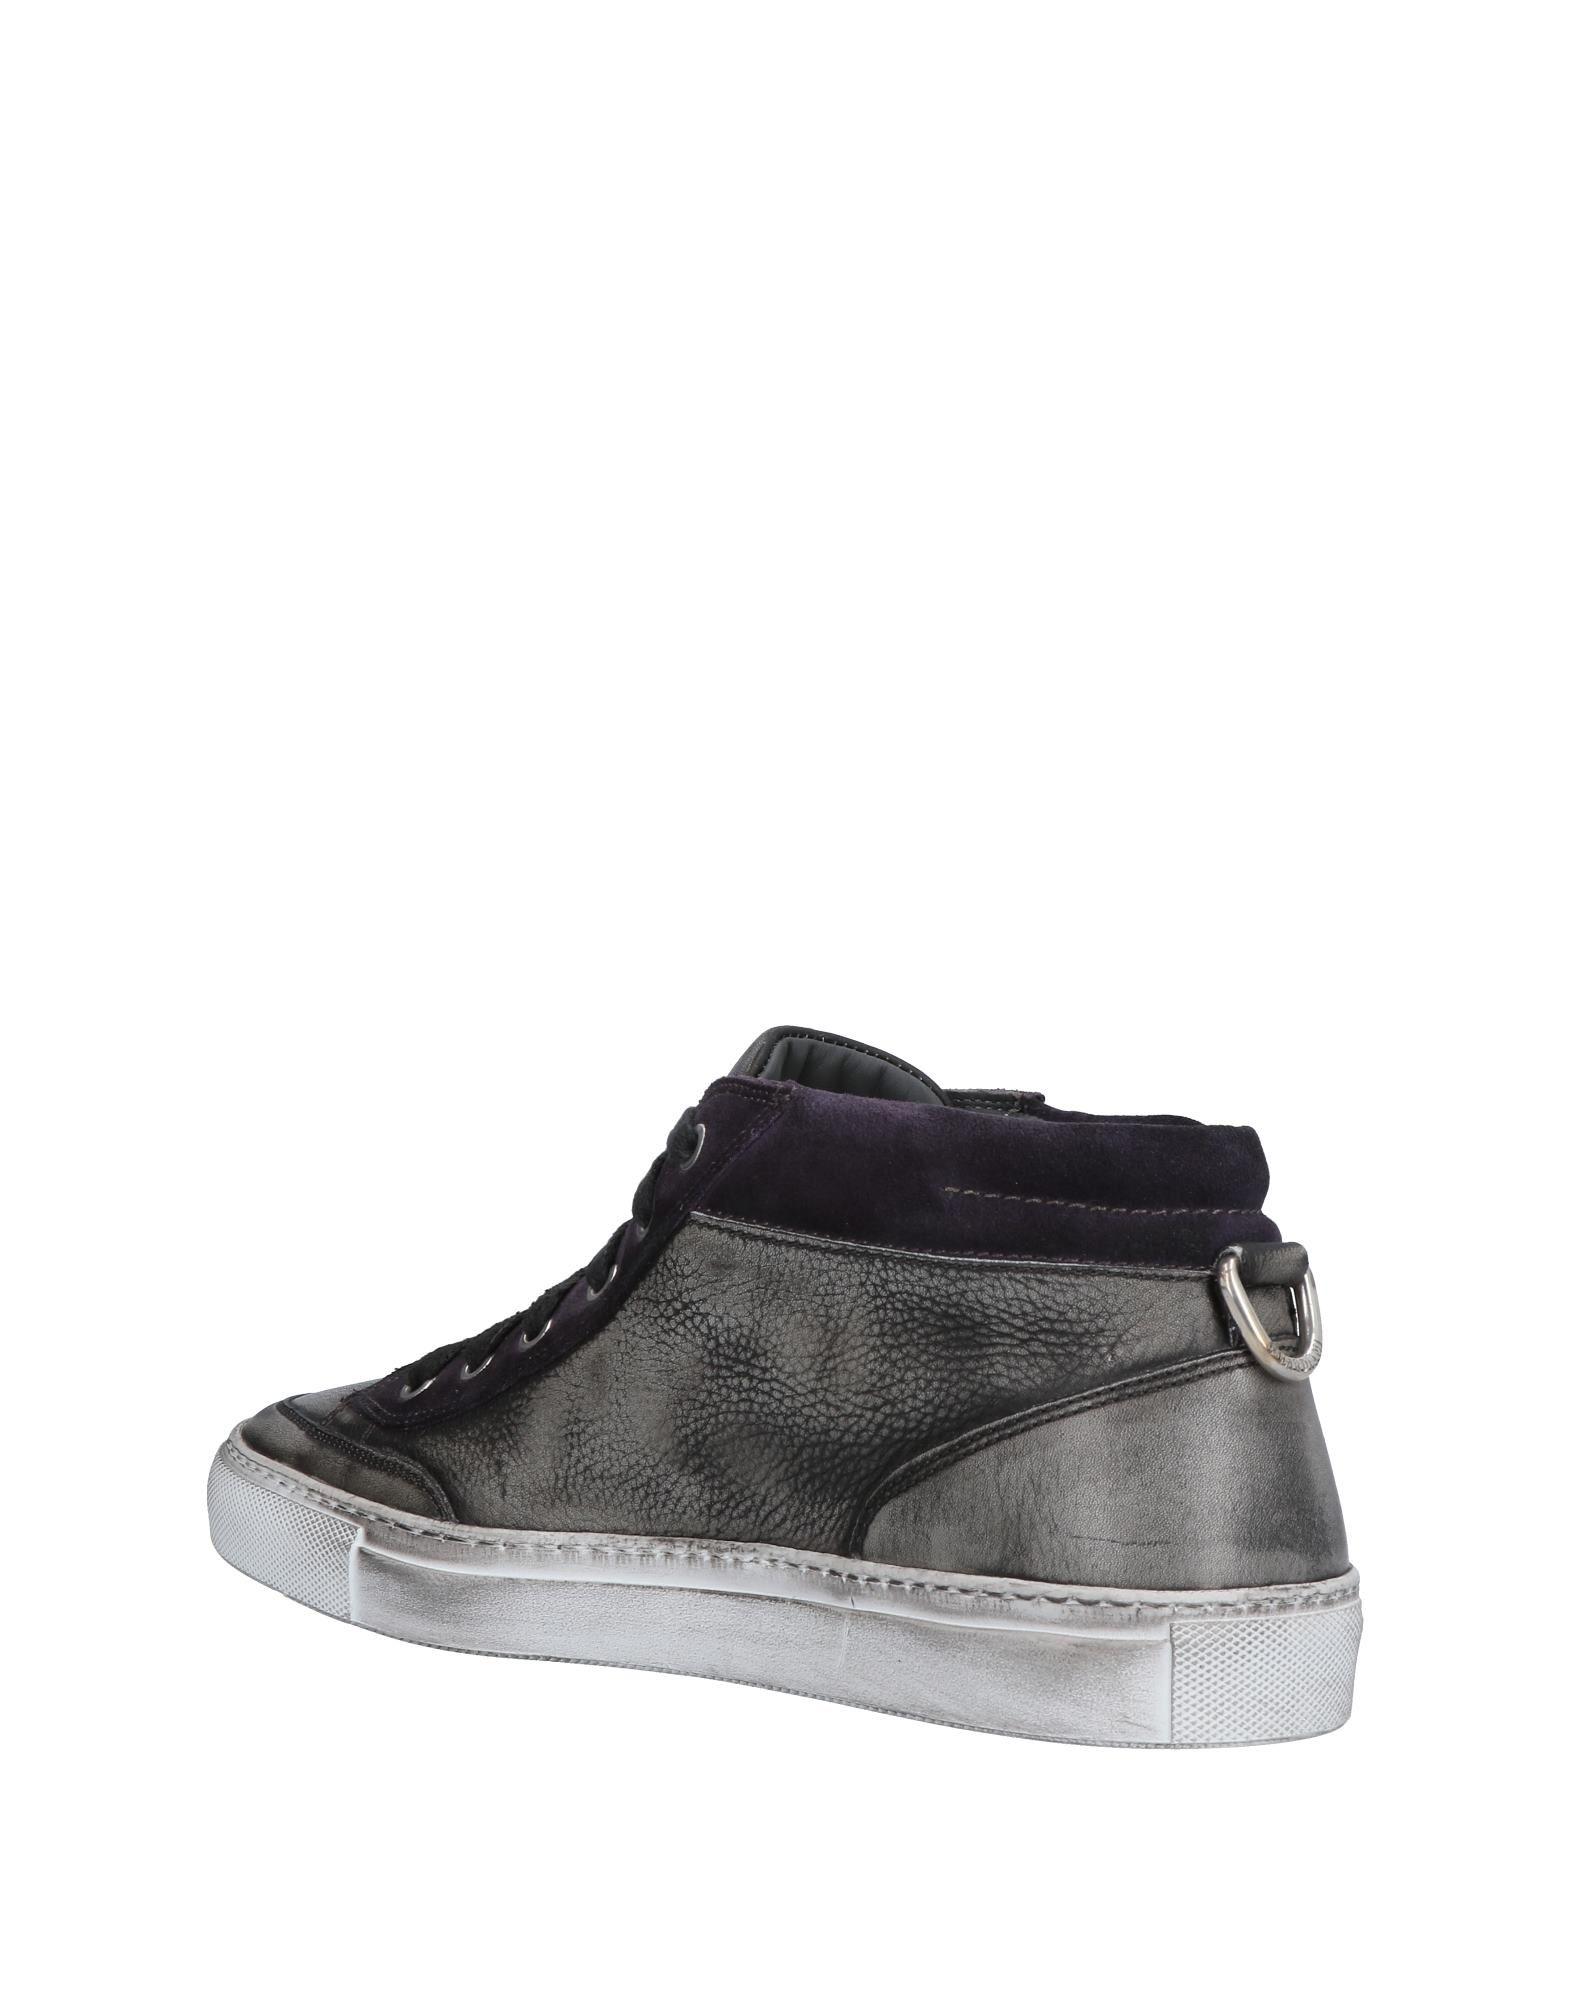 Alberto Guardiani Sneakers Herren 11059070JI  11059070JI Herren 6f1f9e